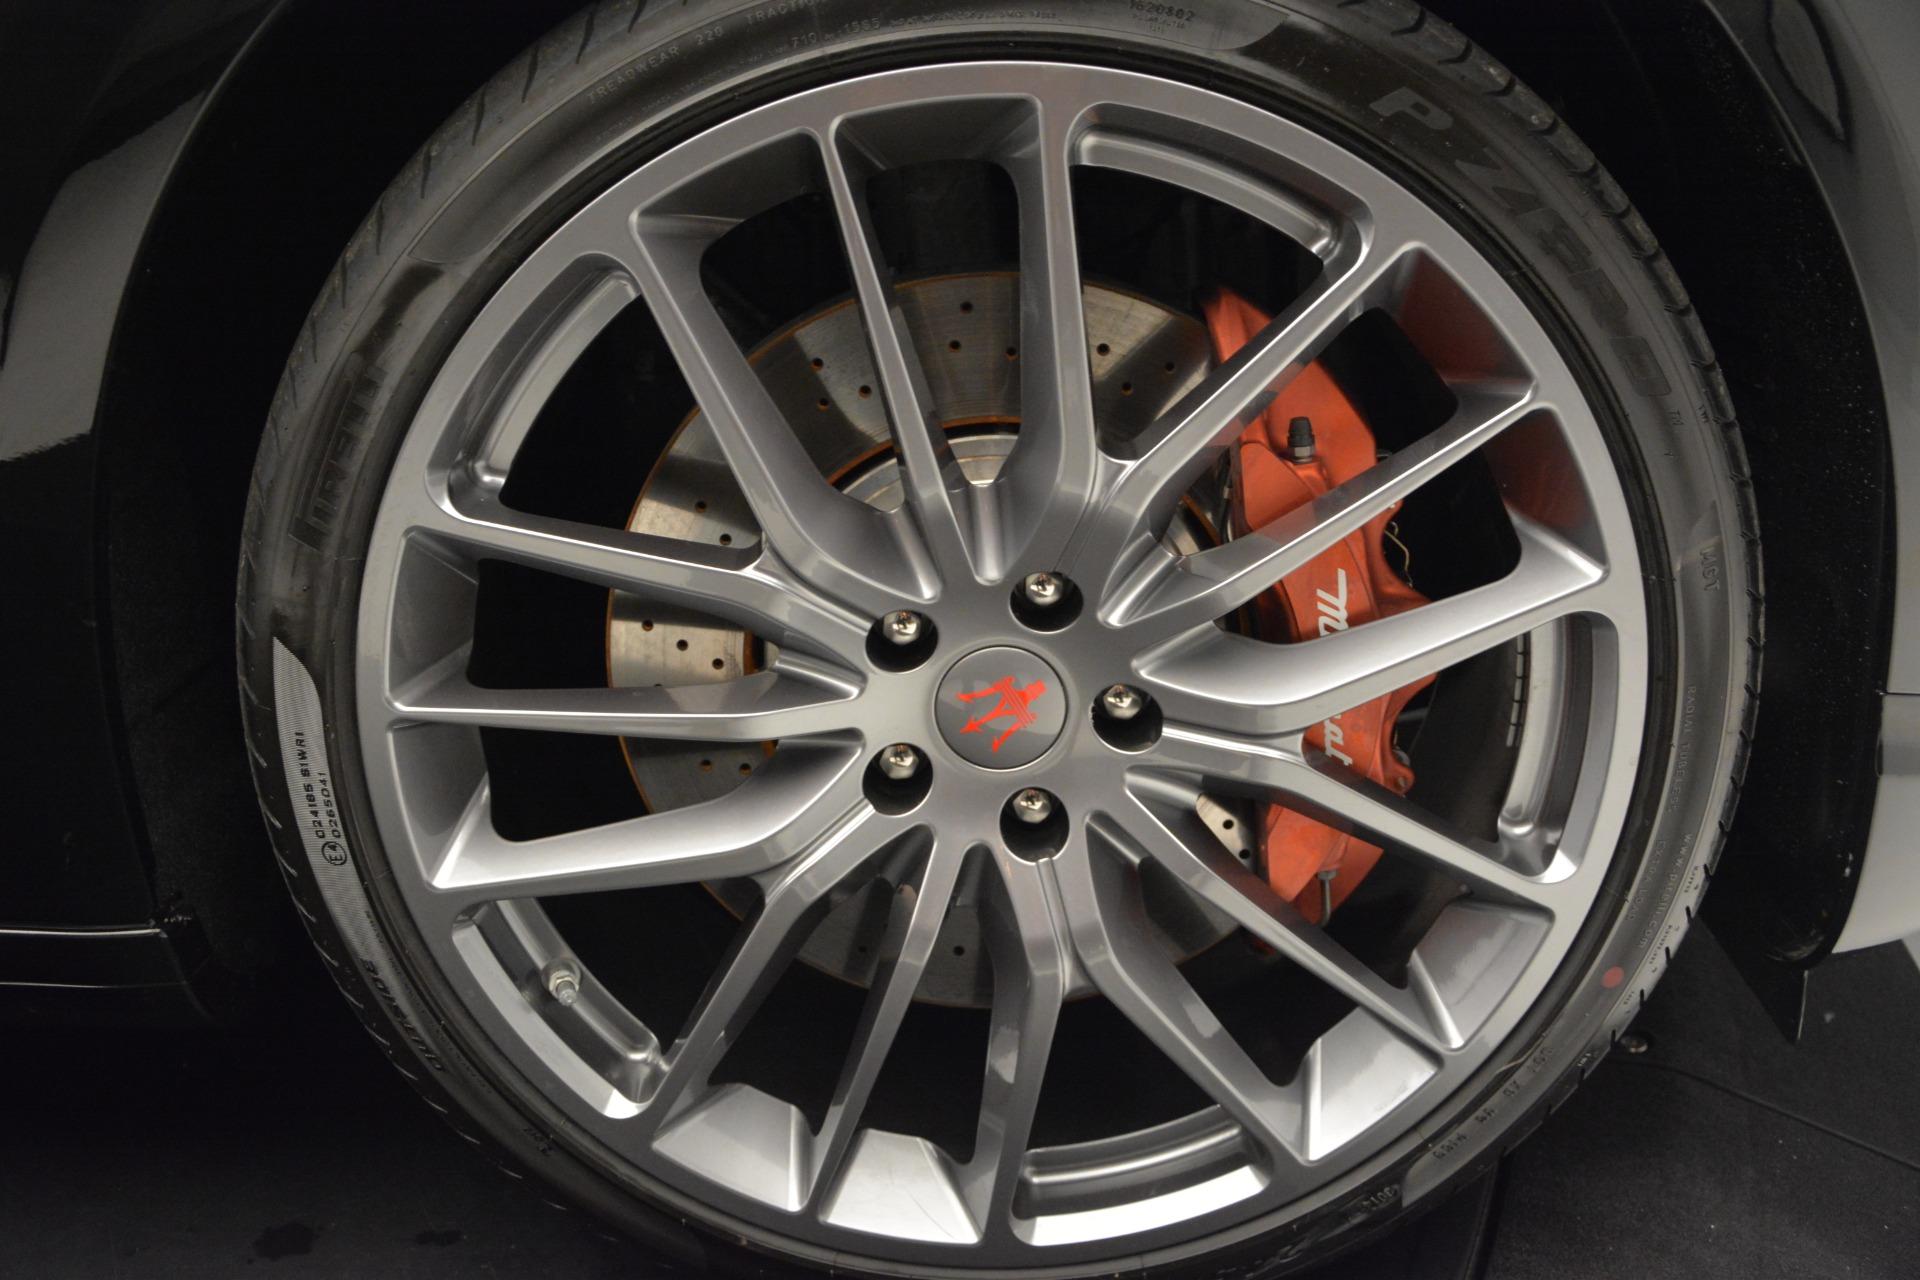 Used 2015 Maserati Quattroporte GTS For Sale In Westport, CT 2993_p23